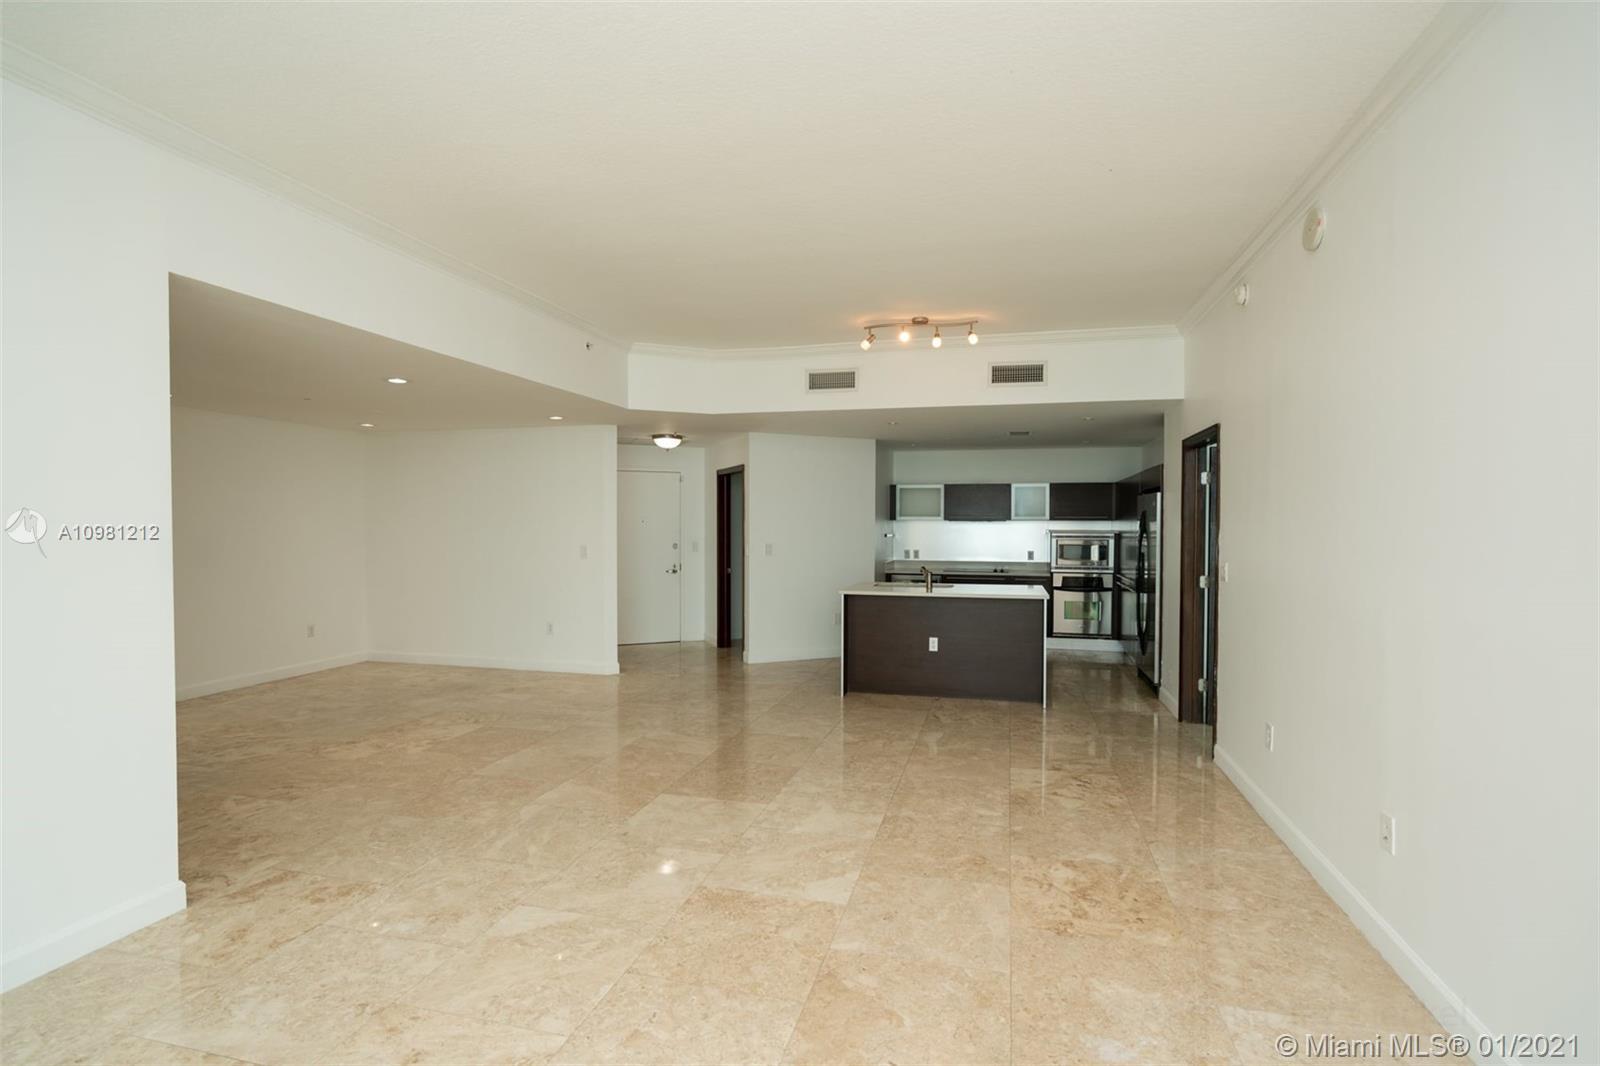 1900 N Bayshore Dr, Miami, Florida 33132, 3 Bedrooms Bedrooms, ,3 BathroomsBathrooms,Residential,For Sale,1900 N Bayshore Dr,A10981212